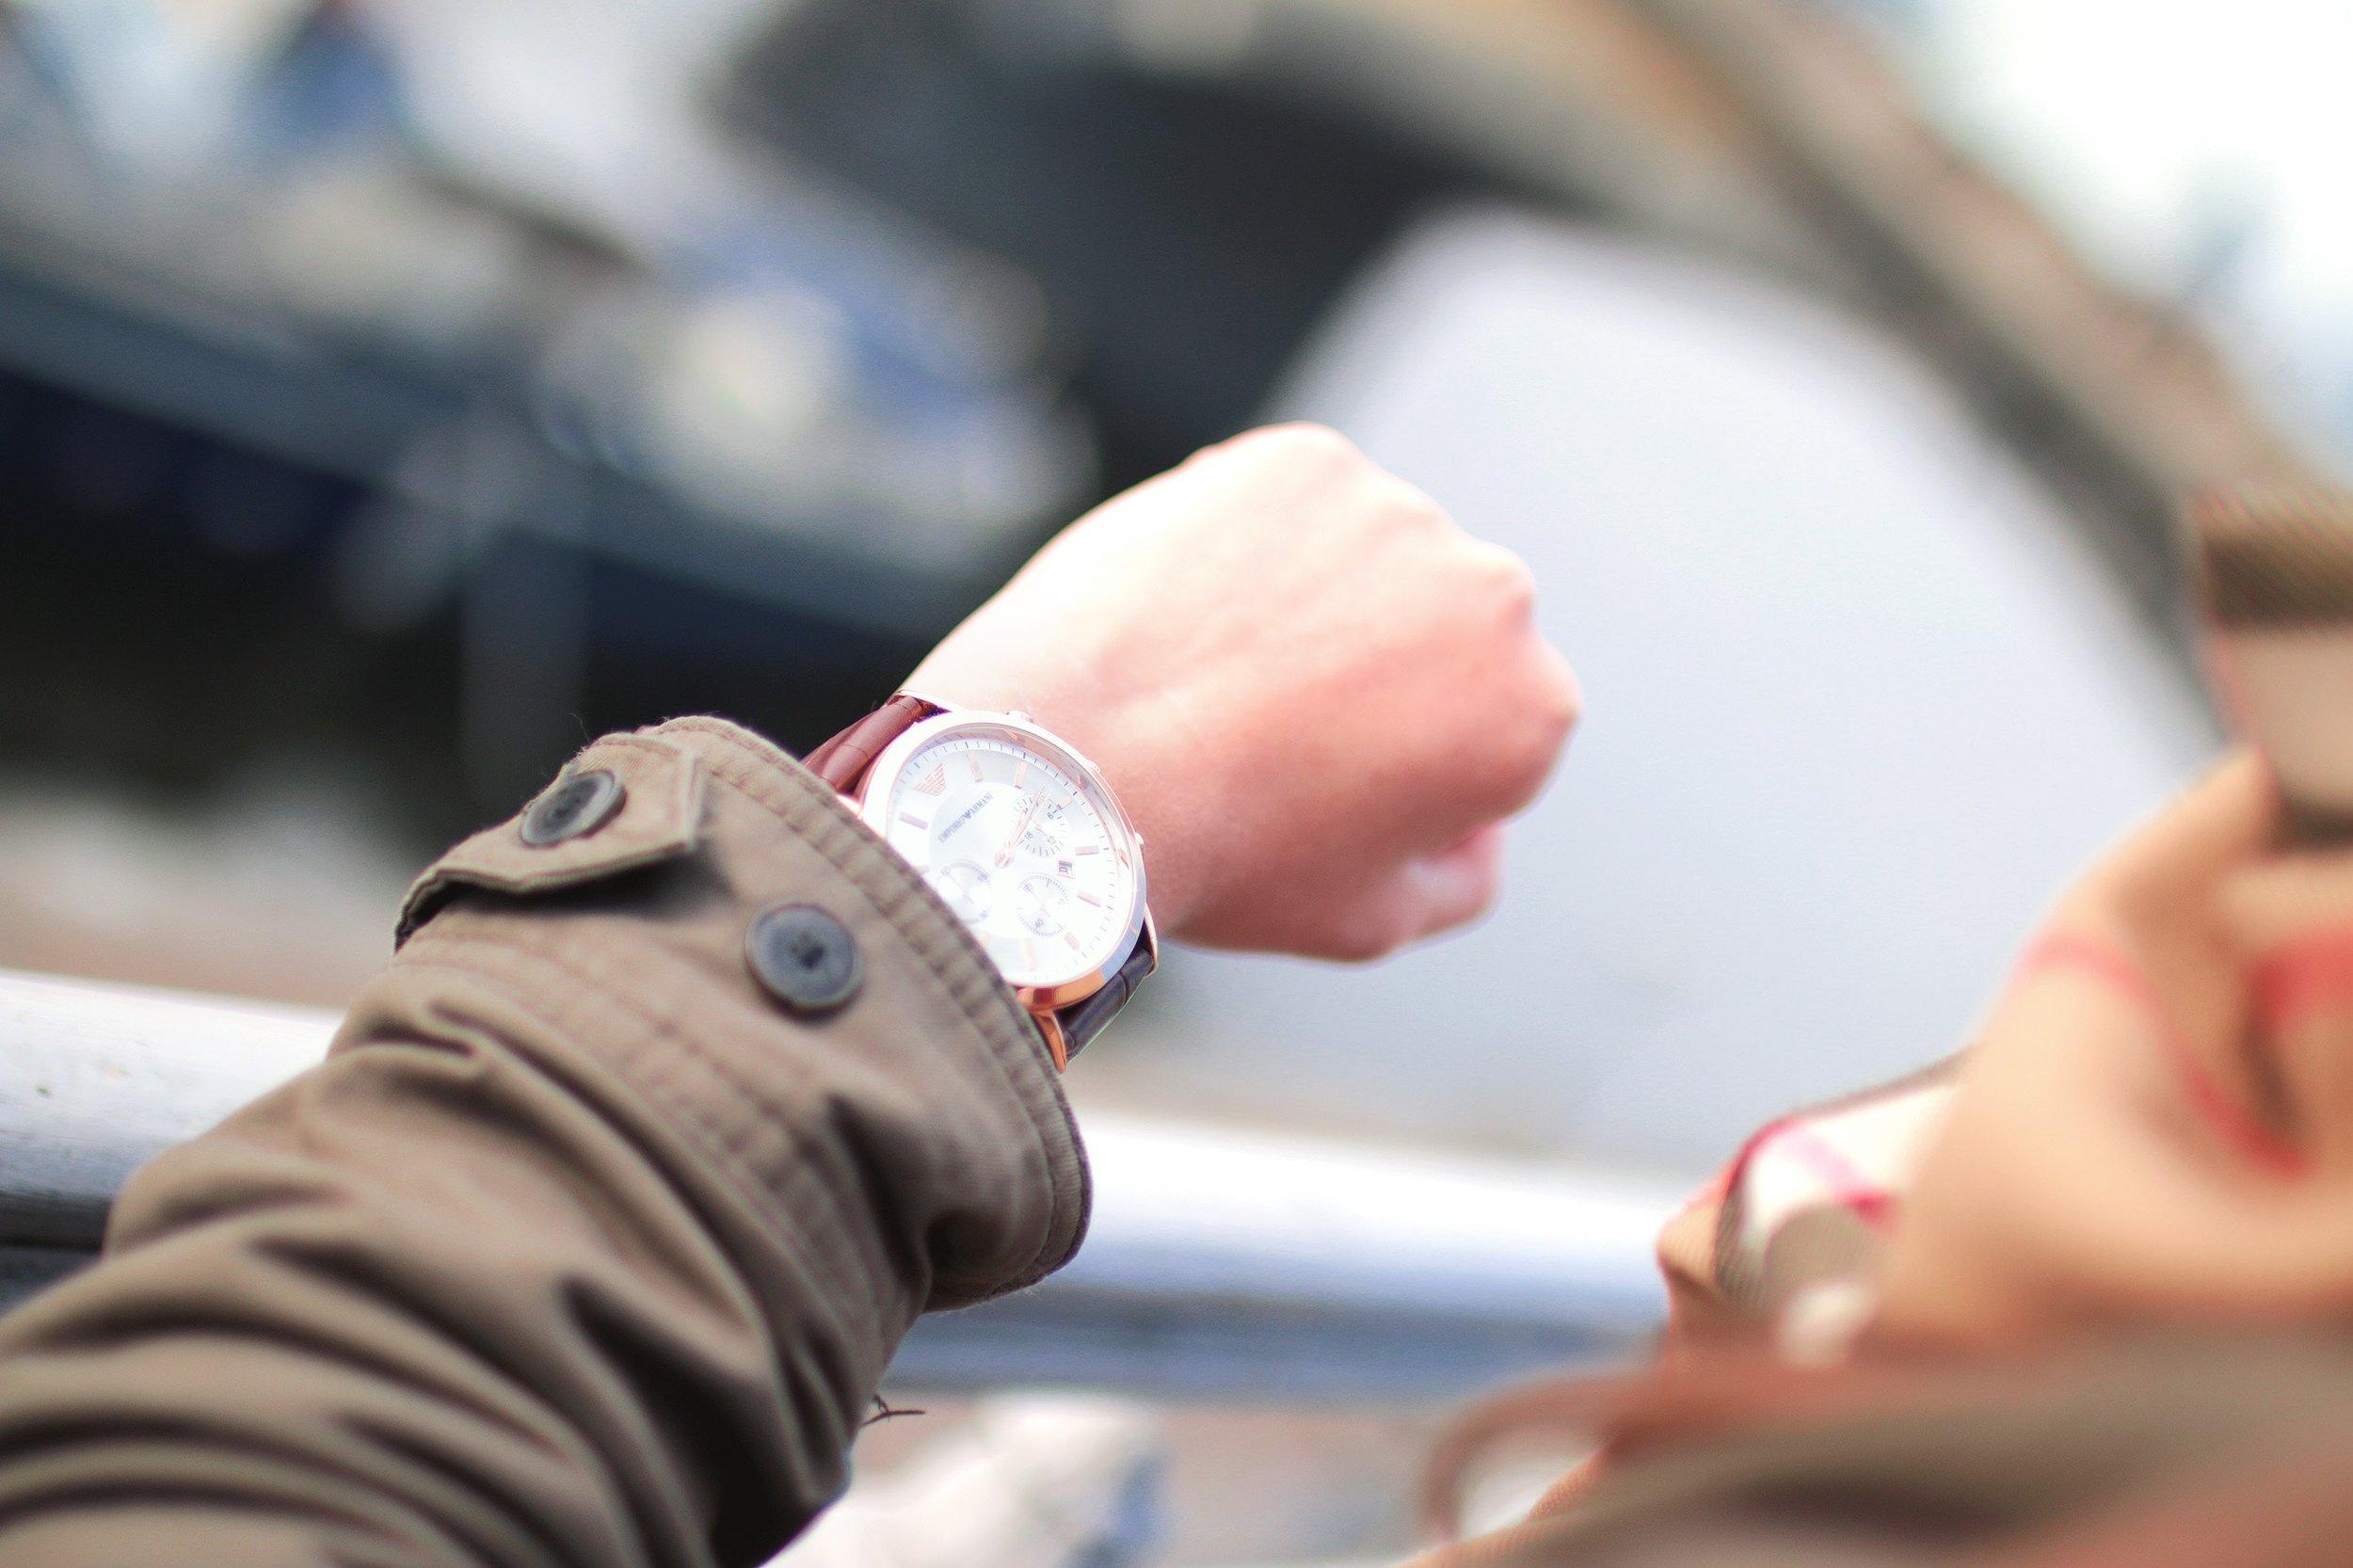 fashion-hand-hurry-4956.jpg